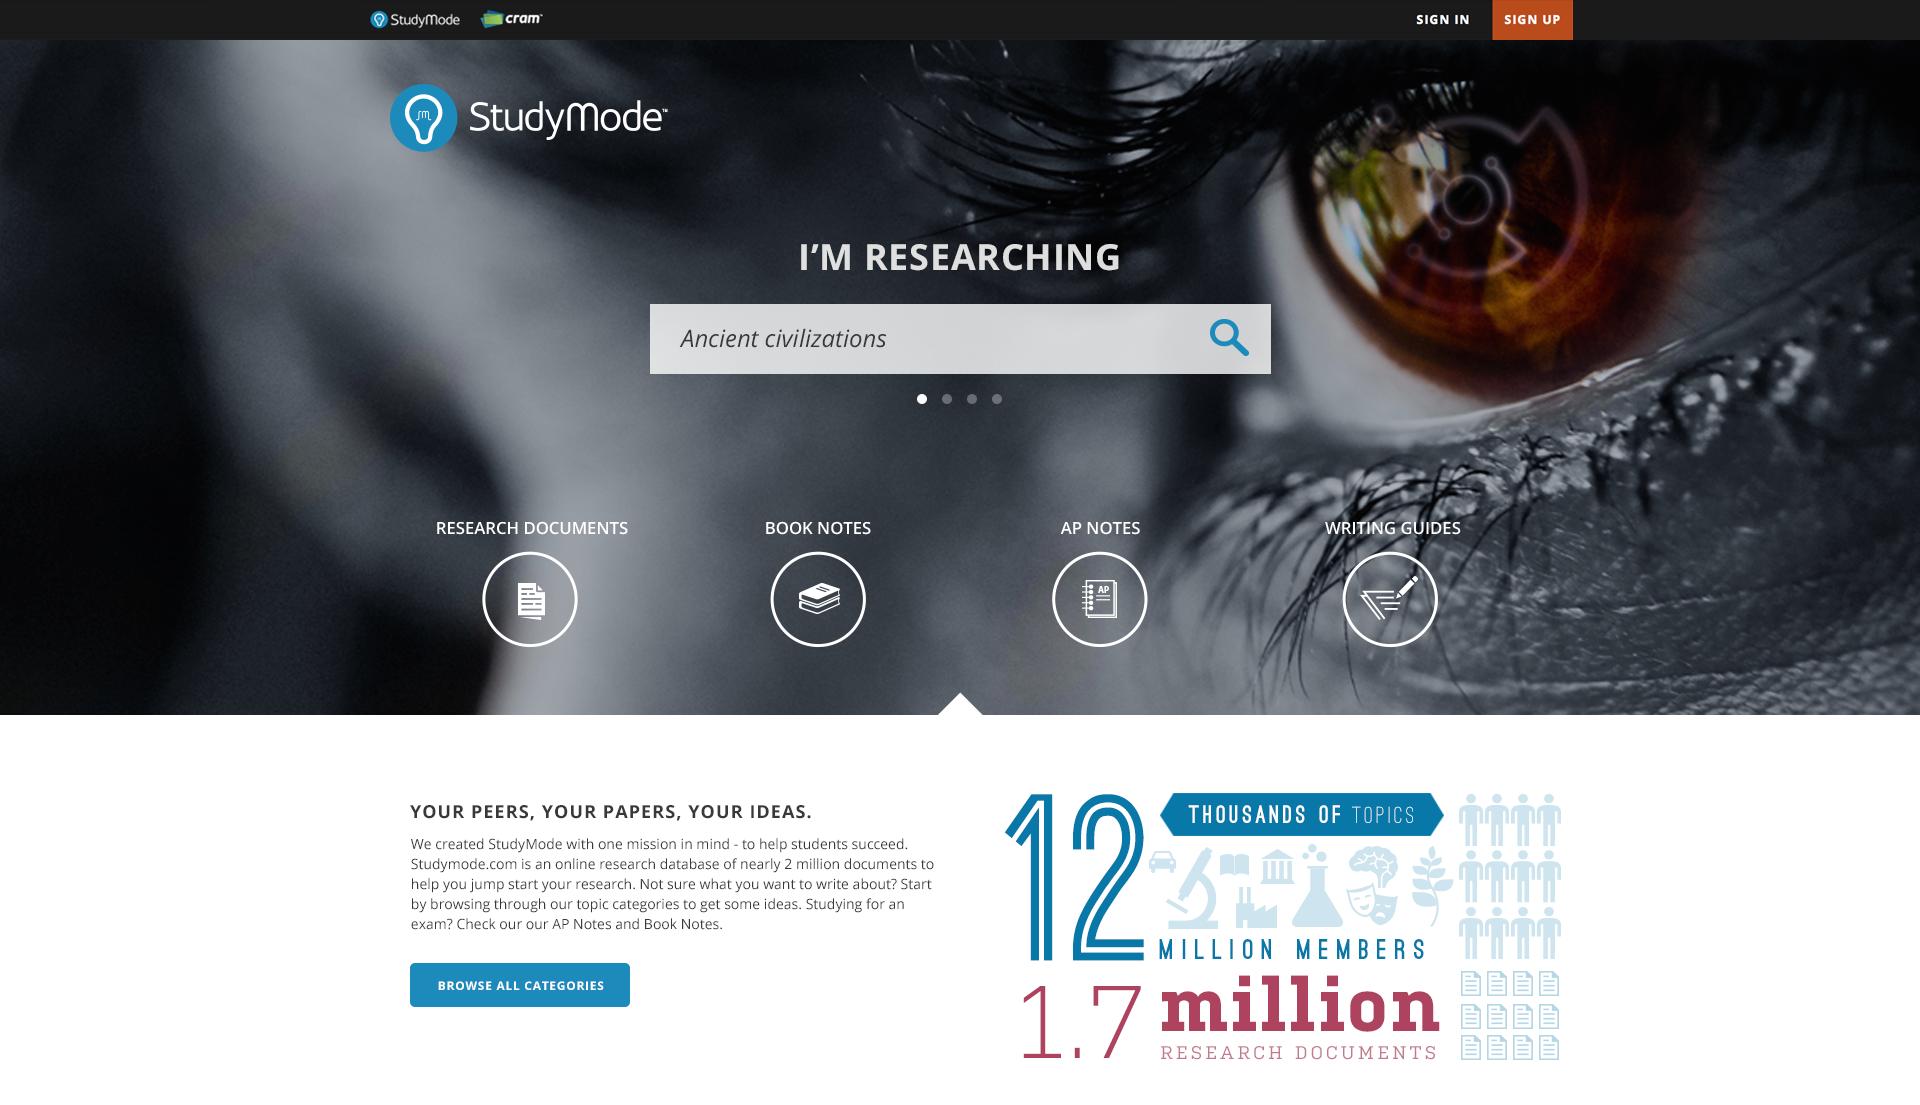 StudyMode Homepage 2014